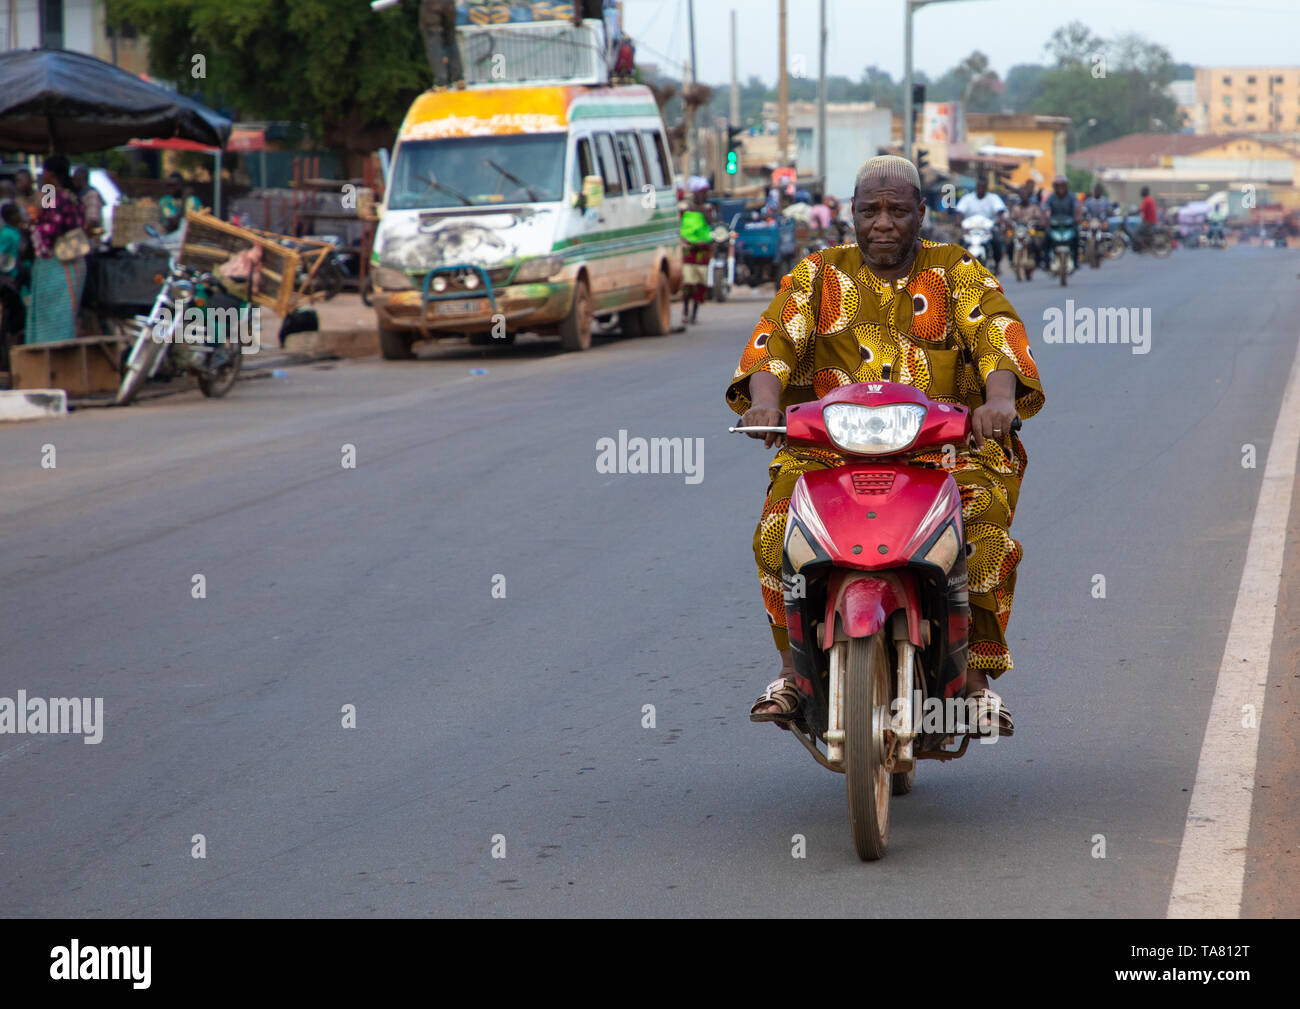 African man riding a motorbike in the street, Poro region, Korhogo, Ivory Coast Stock Photo